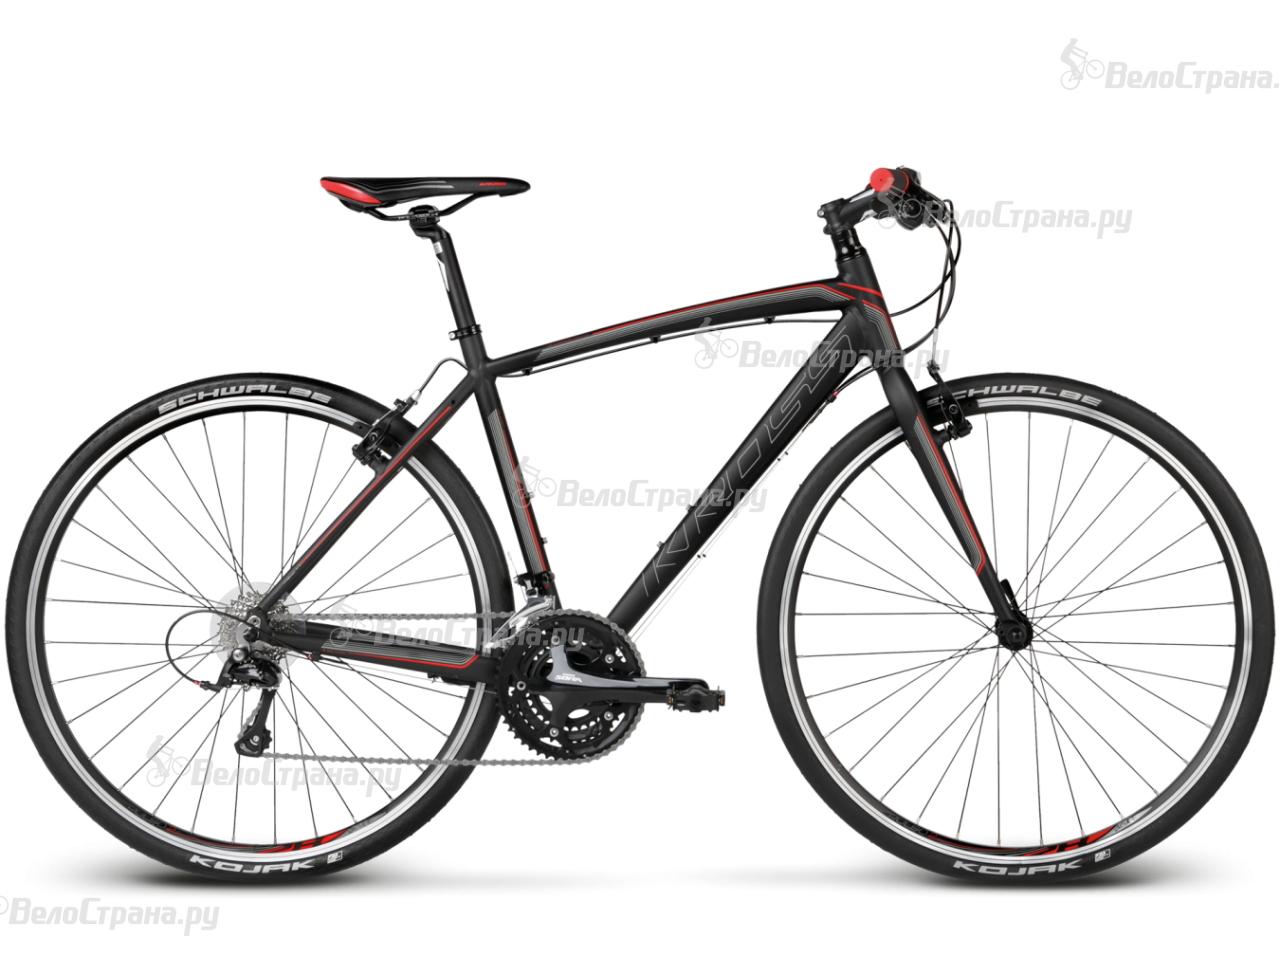 Велосипед Kross PULSO 2 (2017) велосипед kross pulso 1 2015